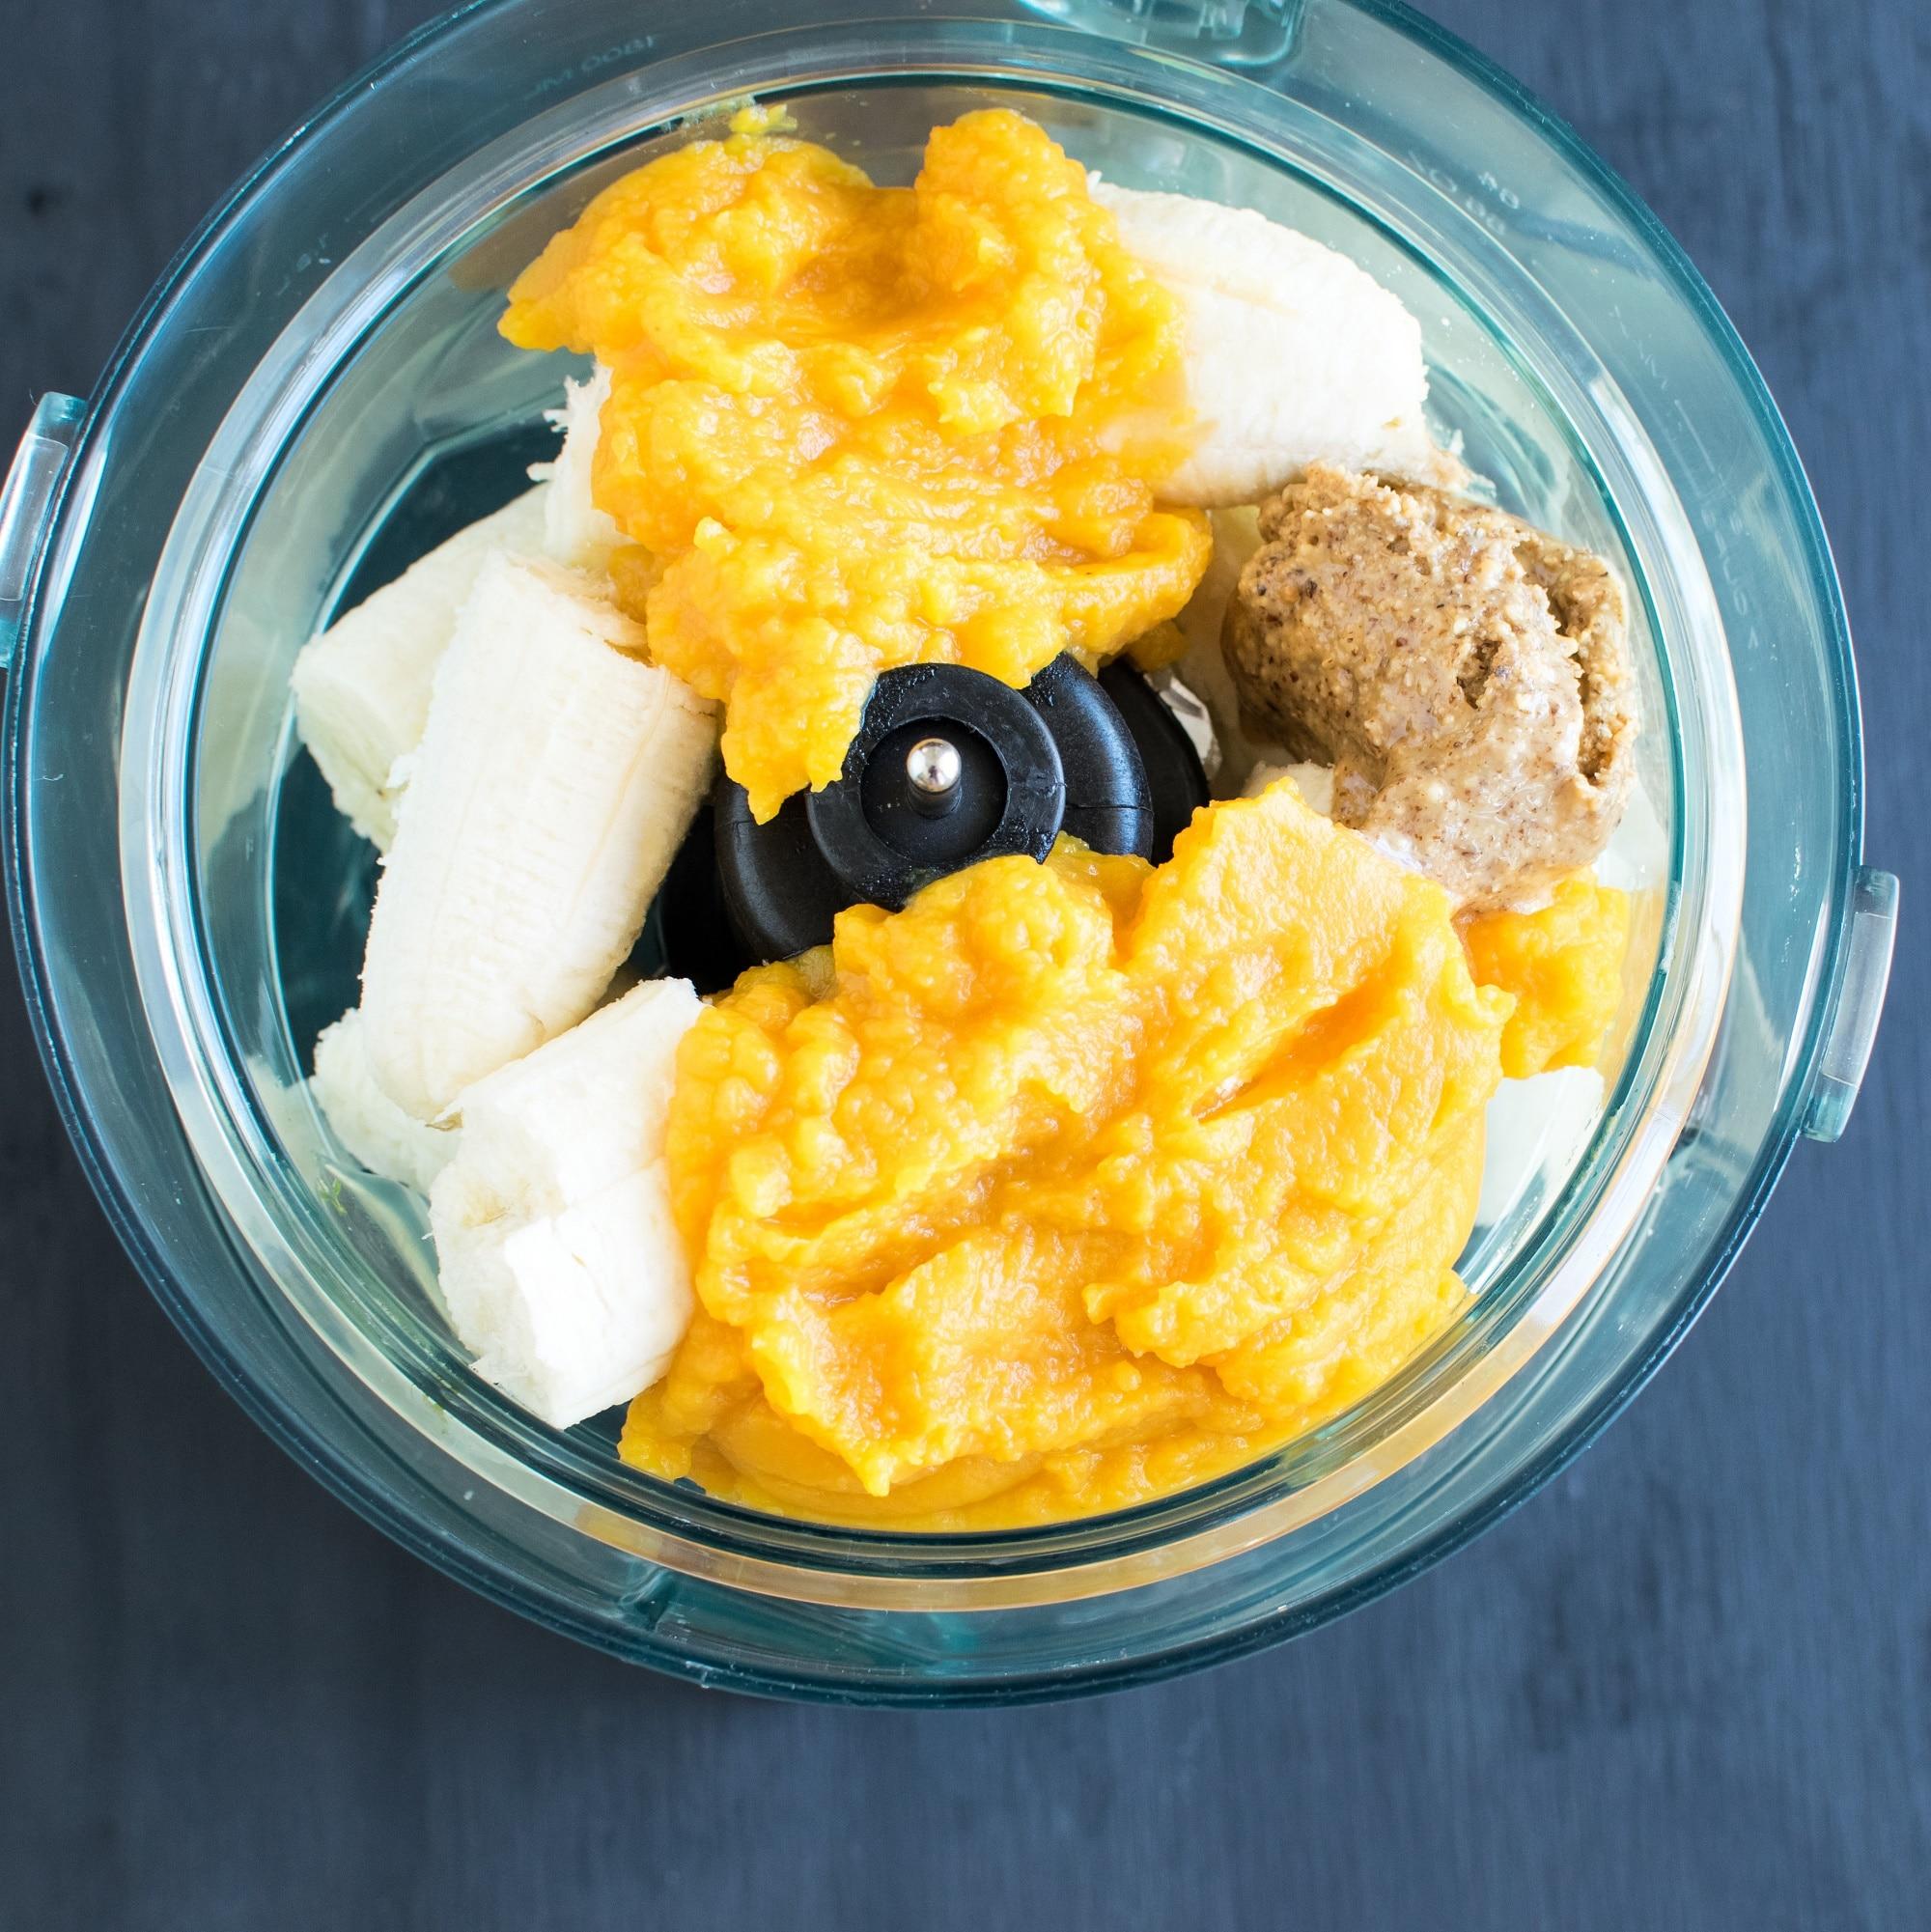 Paleo Pumpkin Almond Waffles | vegan Halloween brunch to indulge guilt-free | cholesterol free and naturally sweetened | kiipfit.com